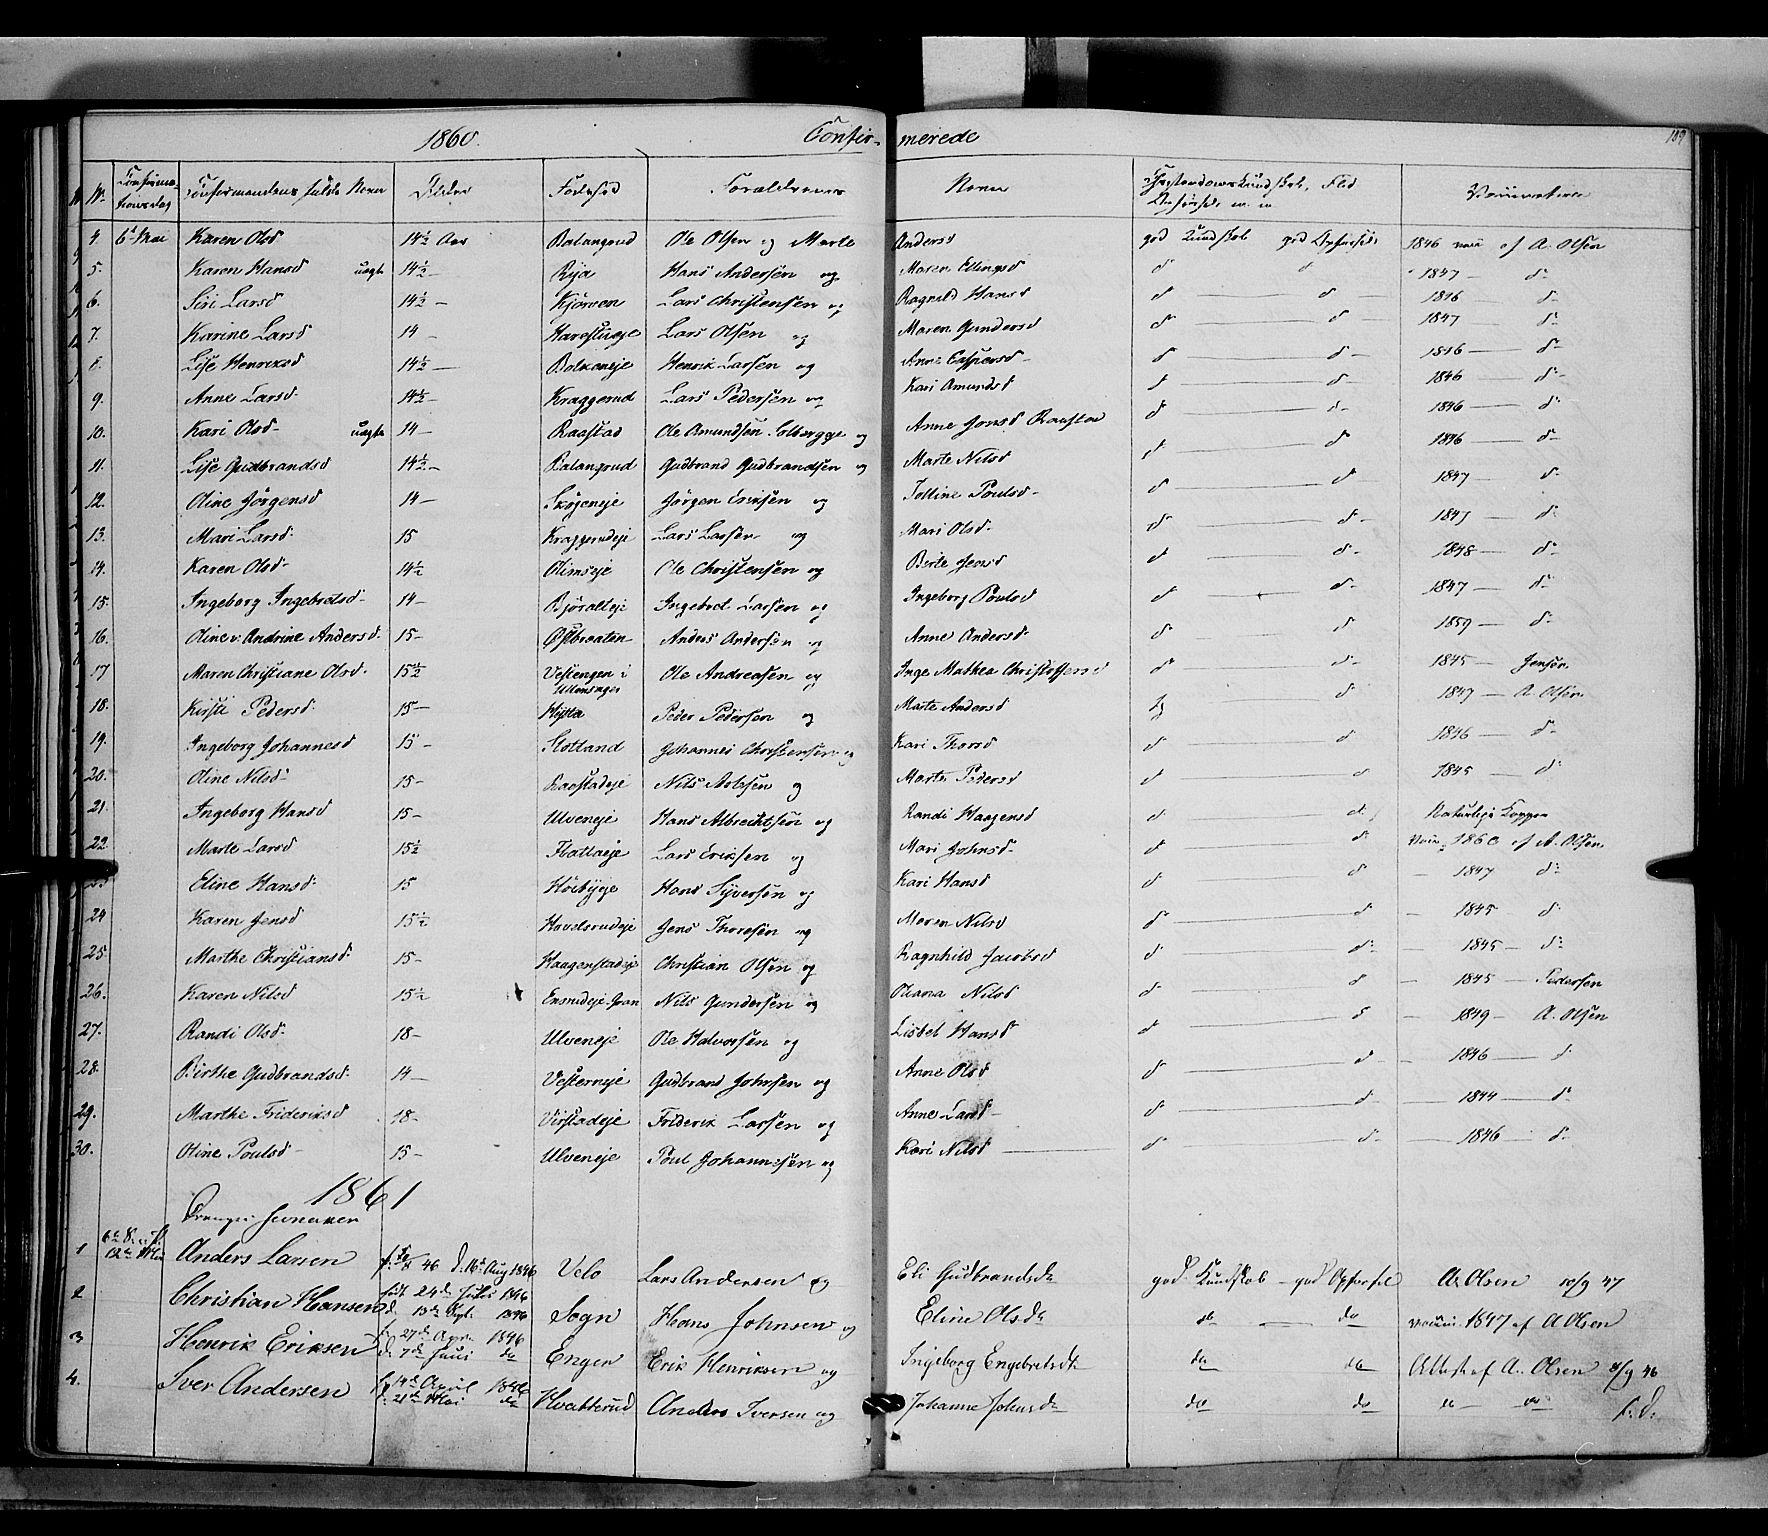 SAH, Jevnaker prestekontor, Ministerialbok nr. 7, 1858-1876, s. 109